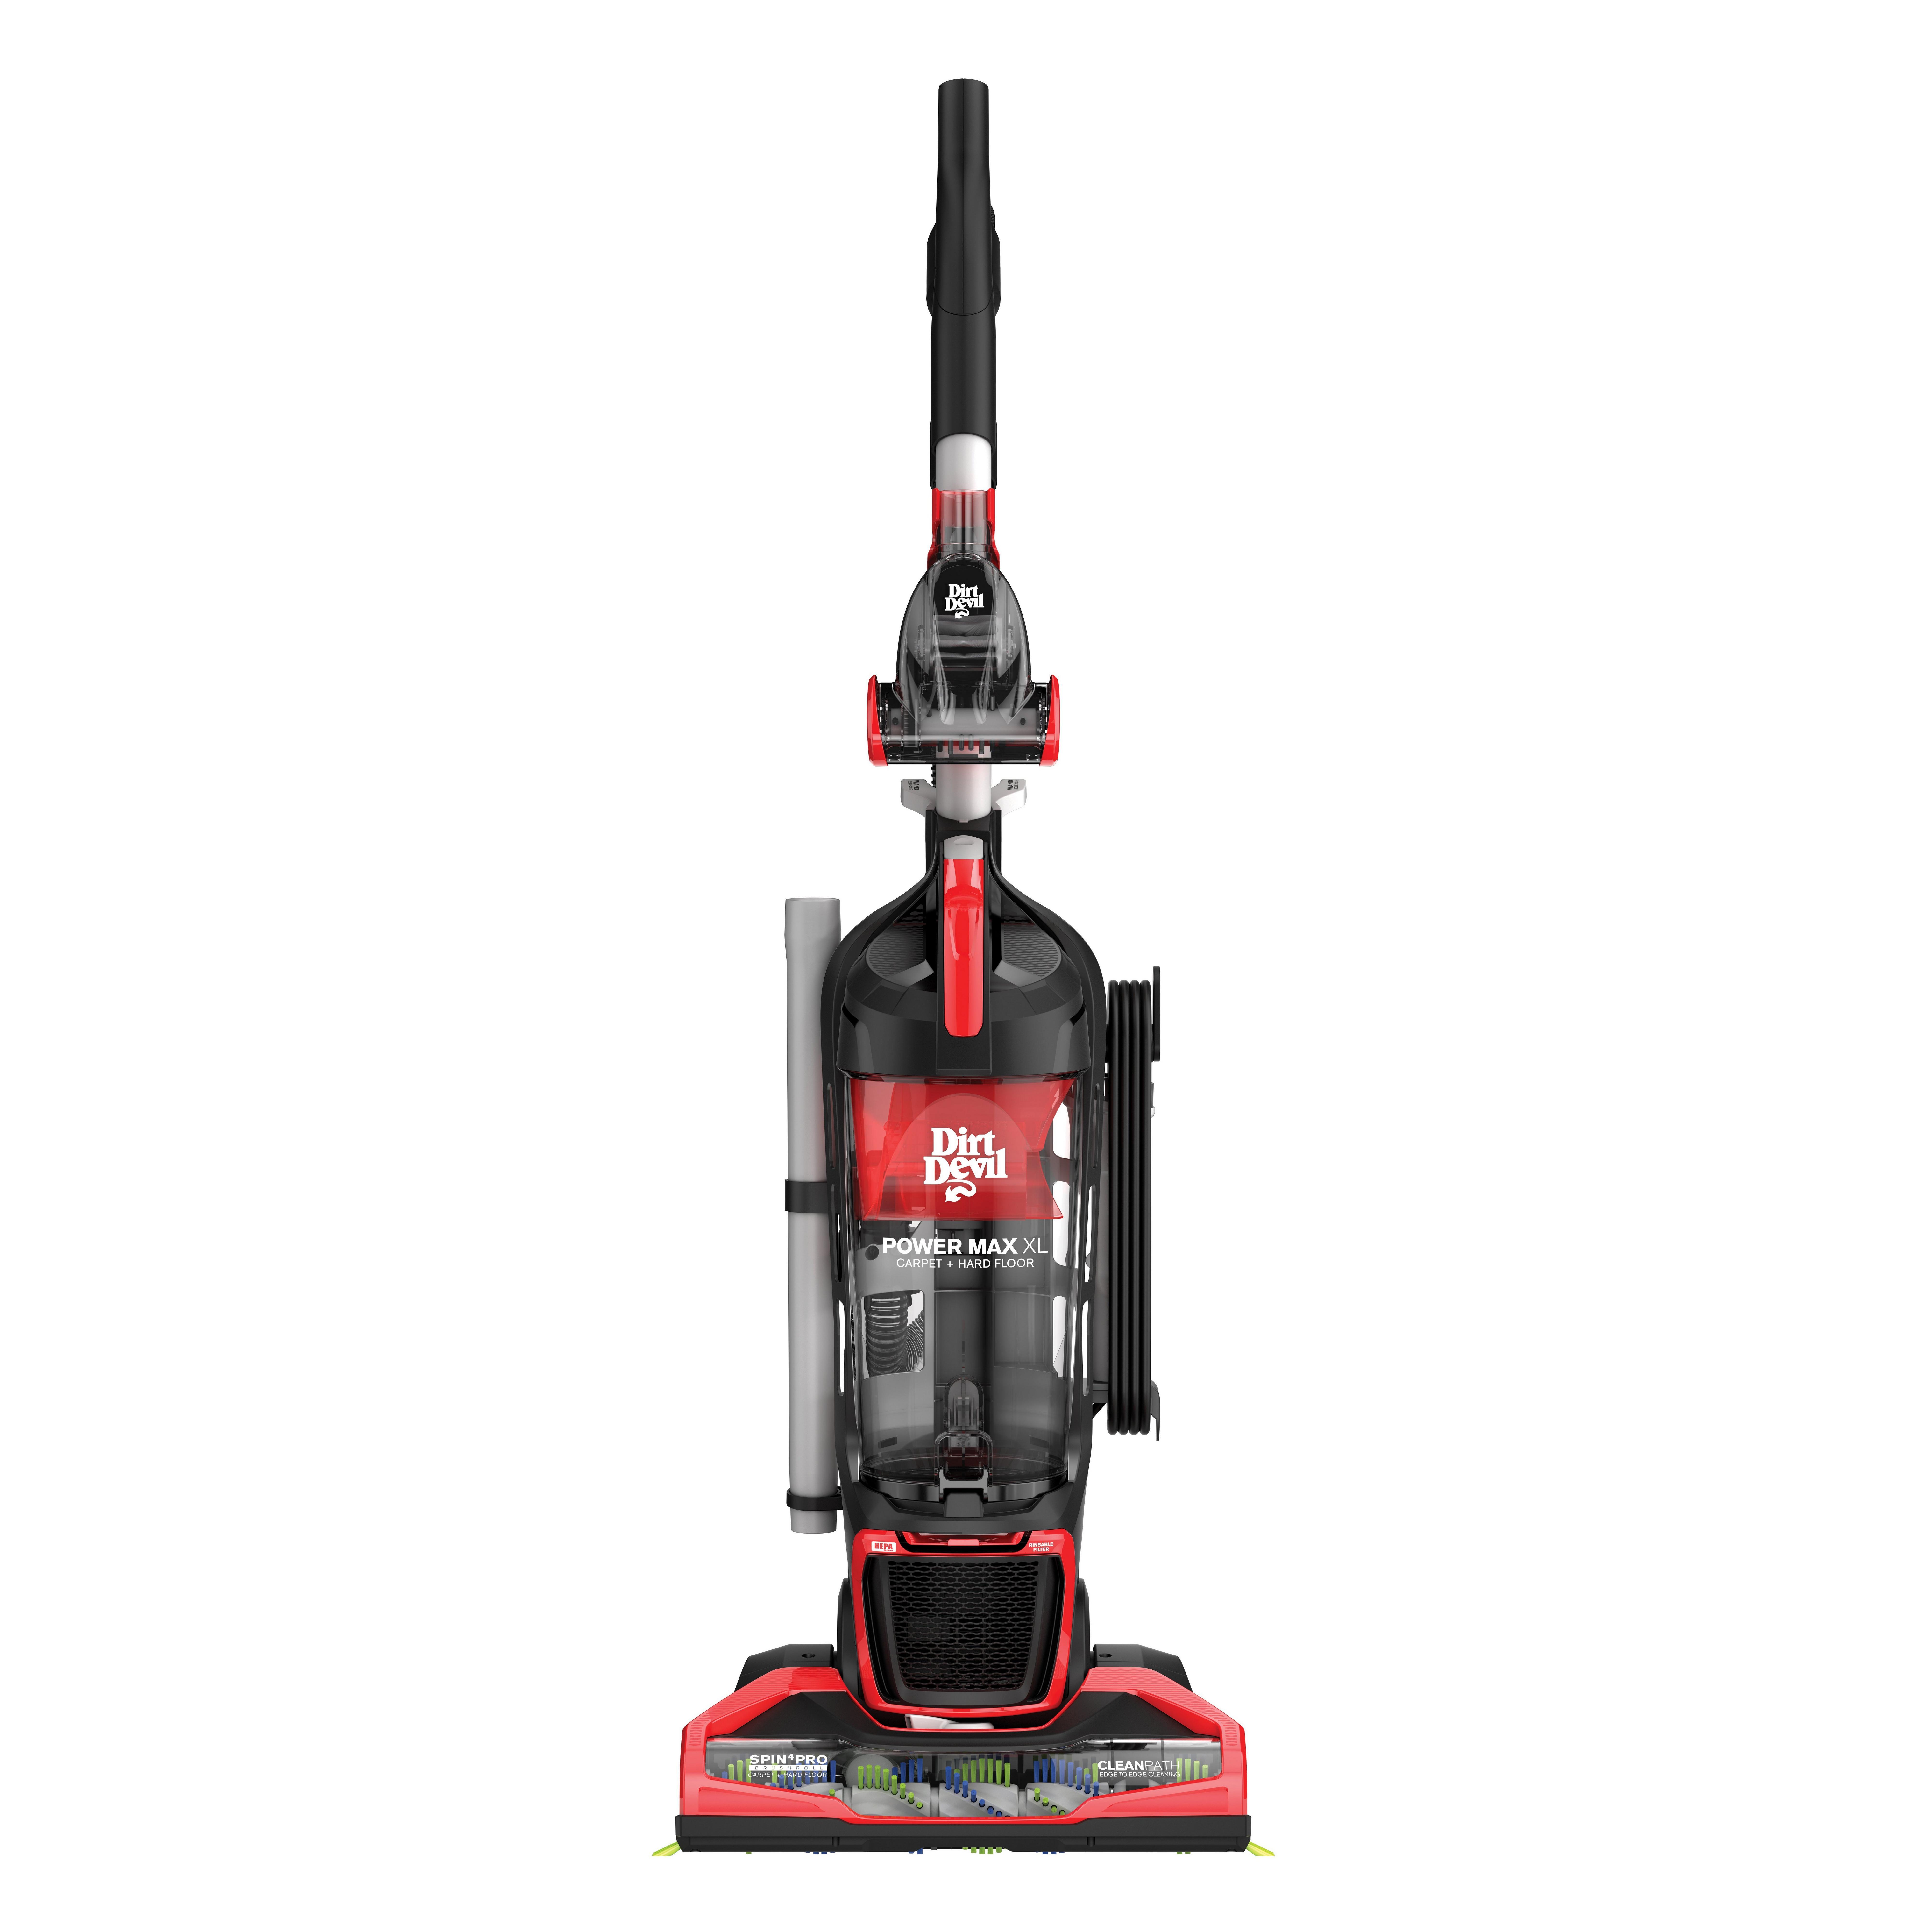 Power Max XL Upright Vacuum1